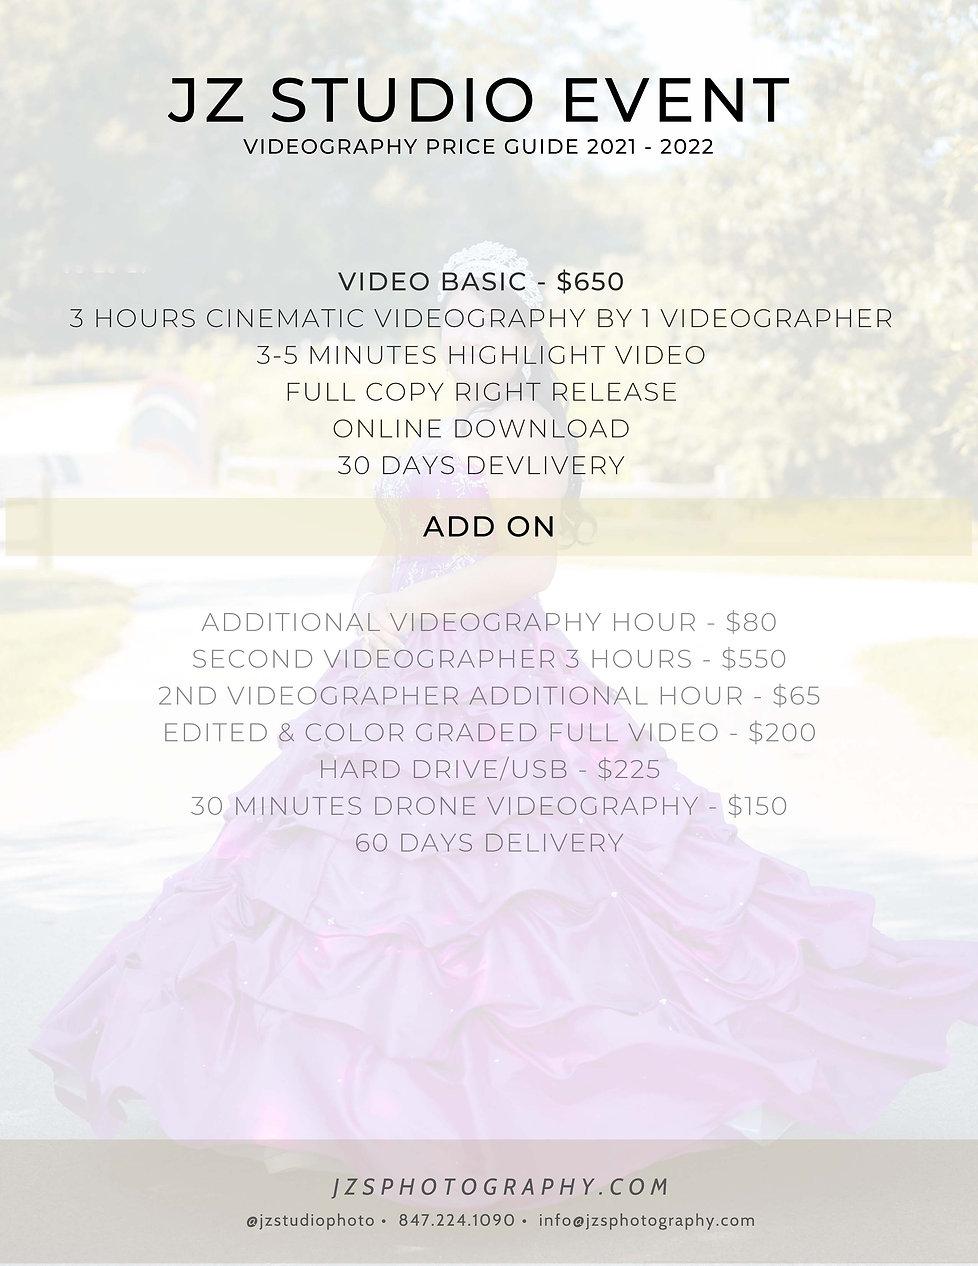 jzs_event-video-price_21-22 copy.jpg